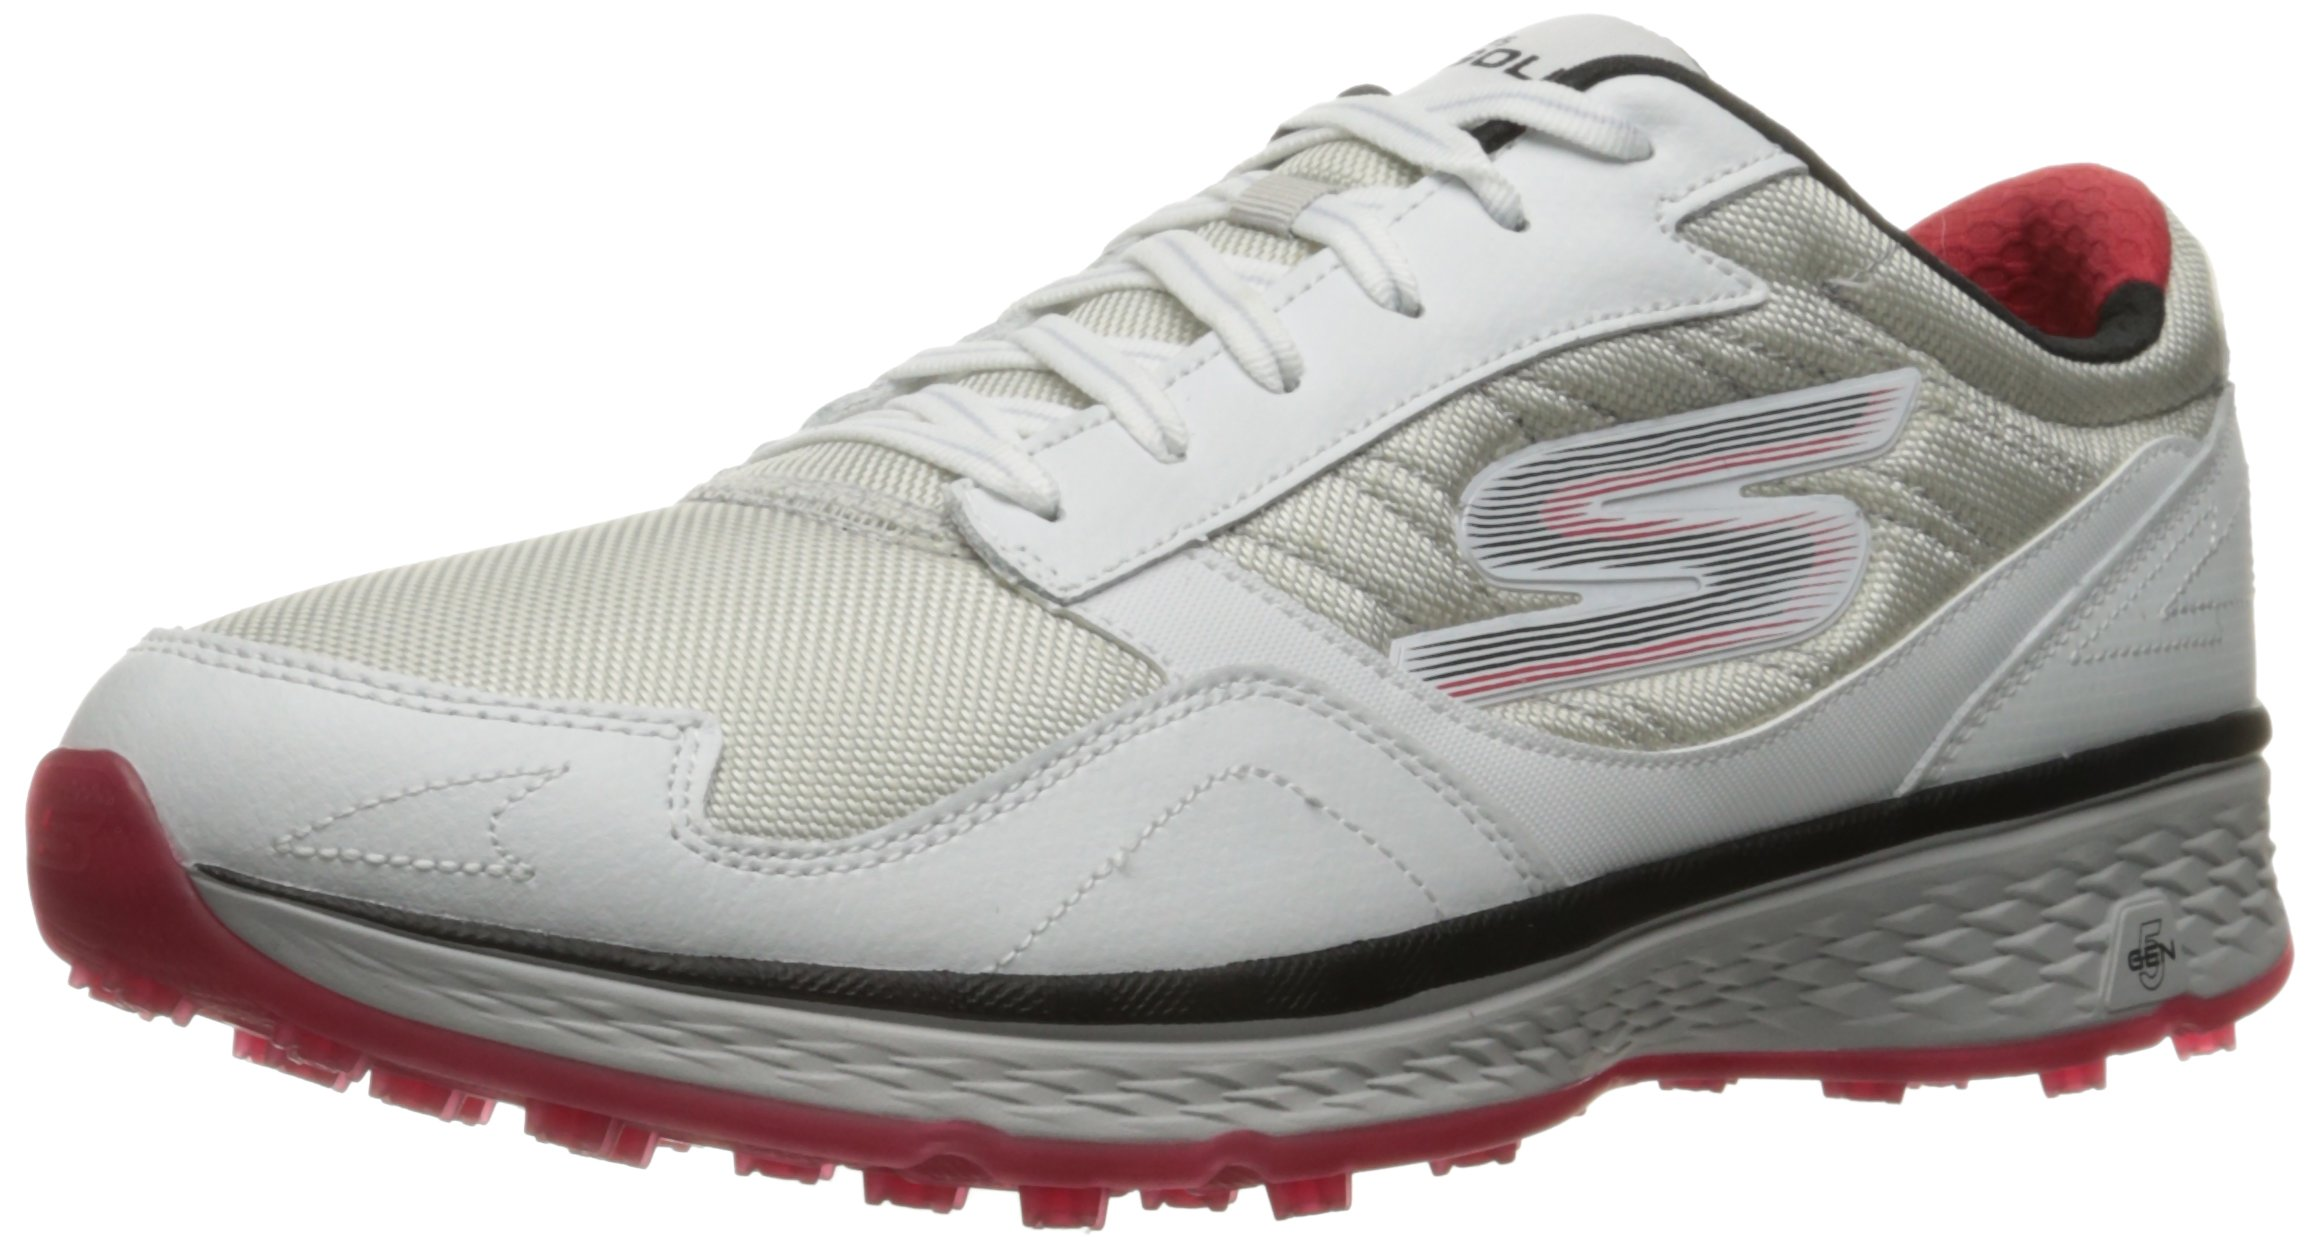 Skechers Golf Men's Go Golf Fairway Golf Shoe, White/Blue/Red, 7.5 M US